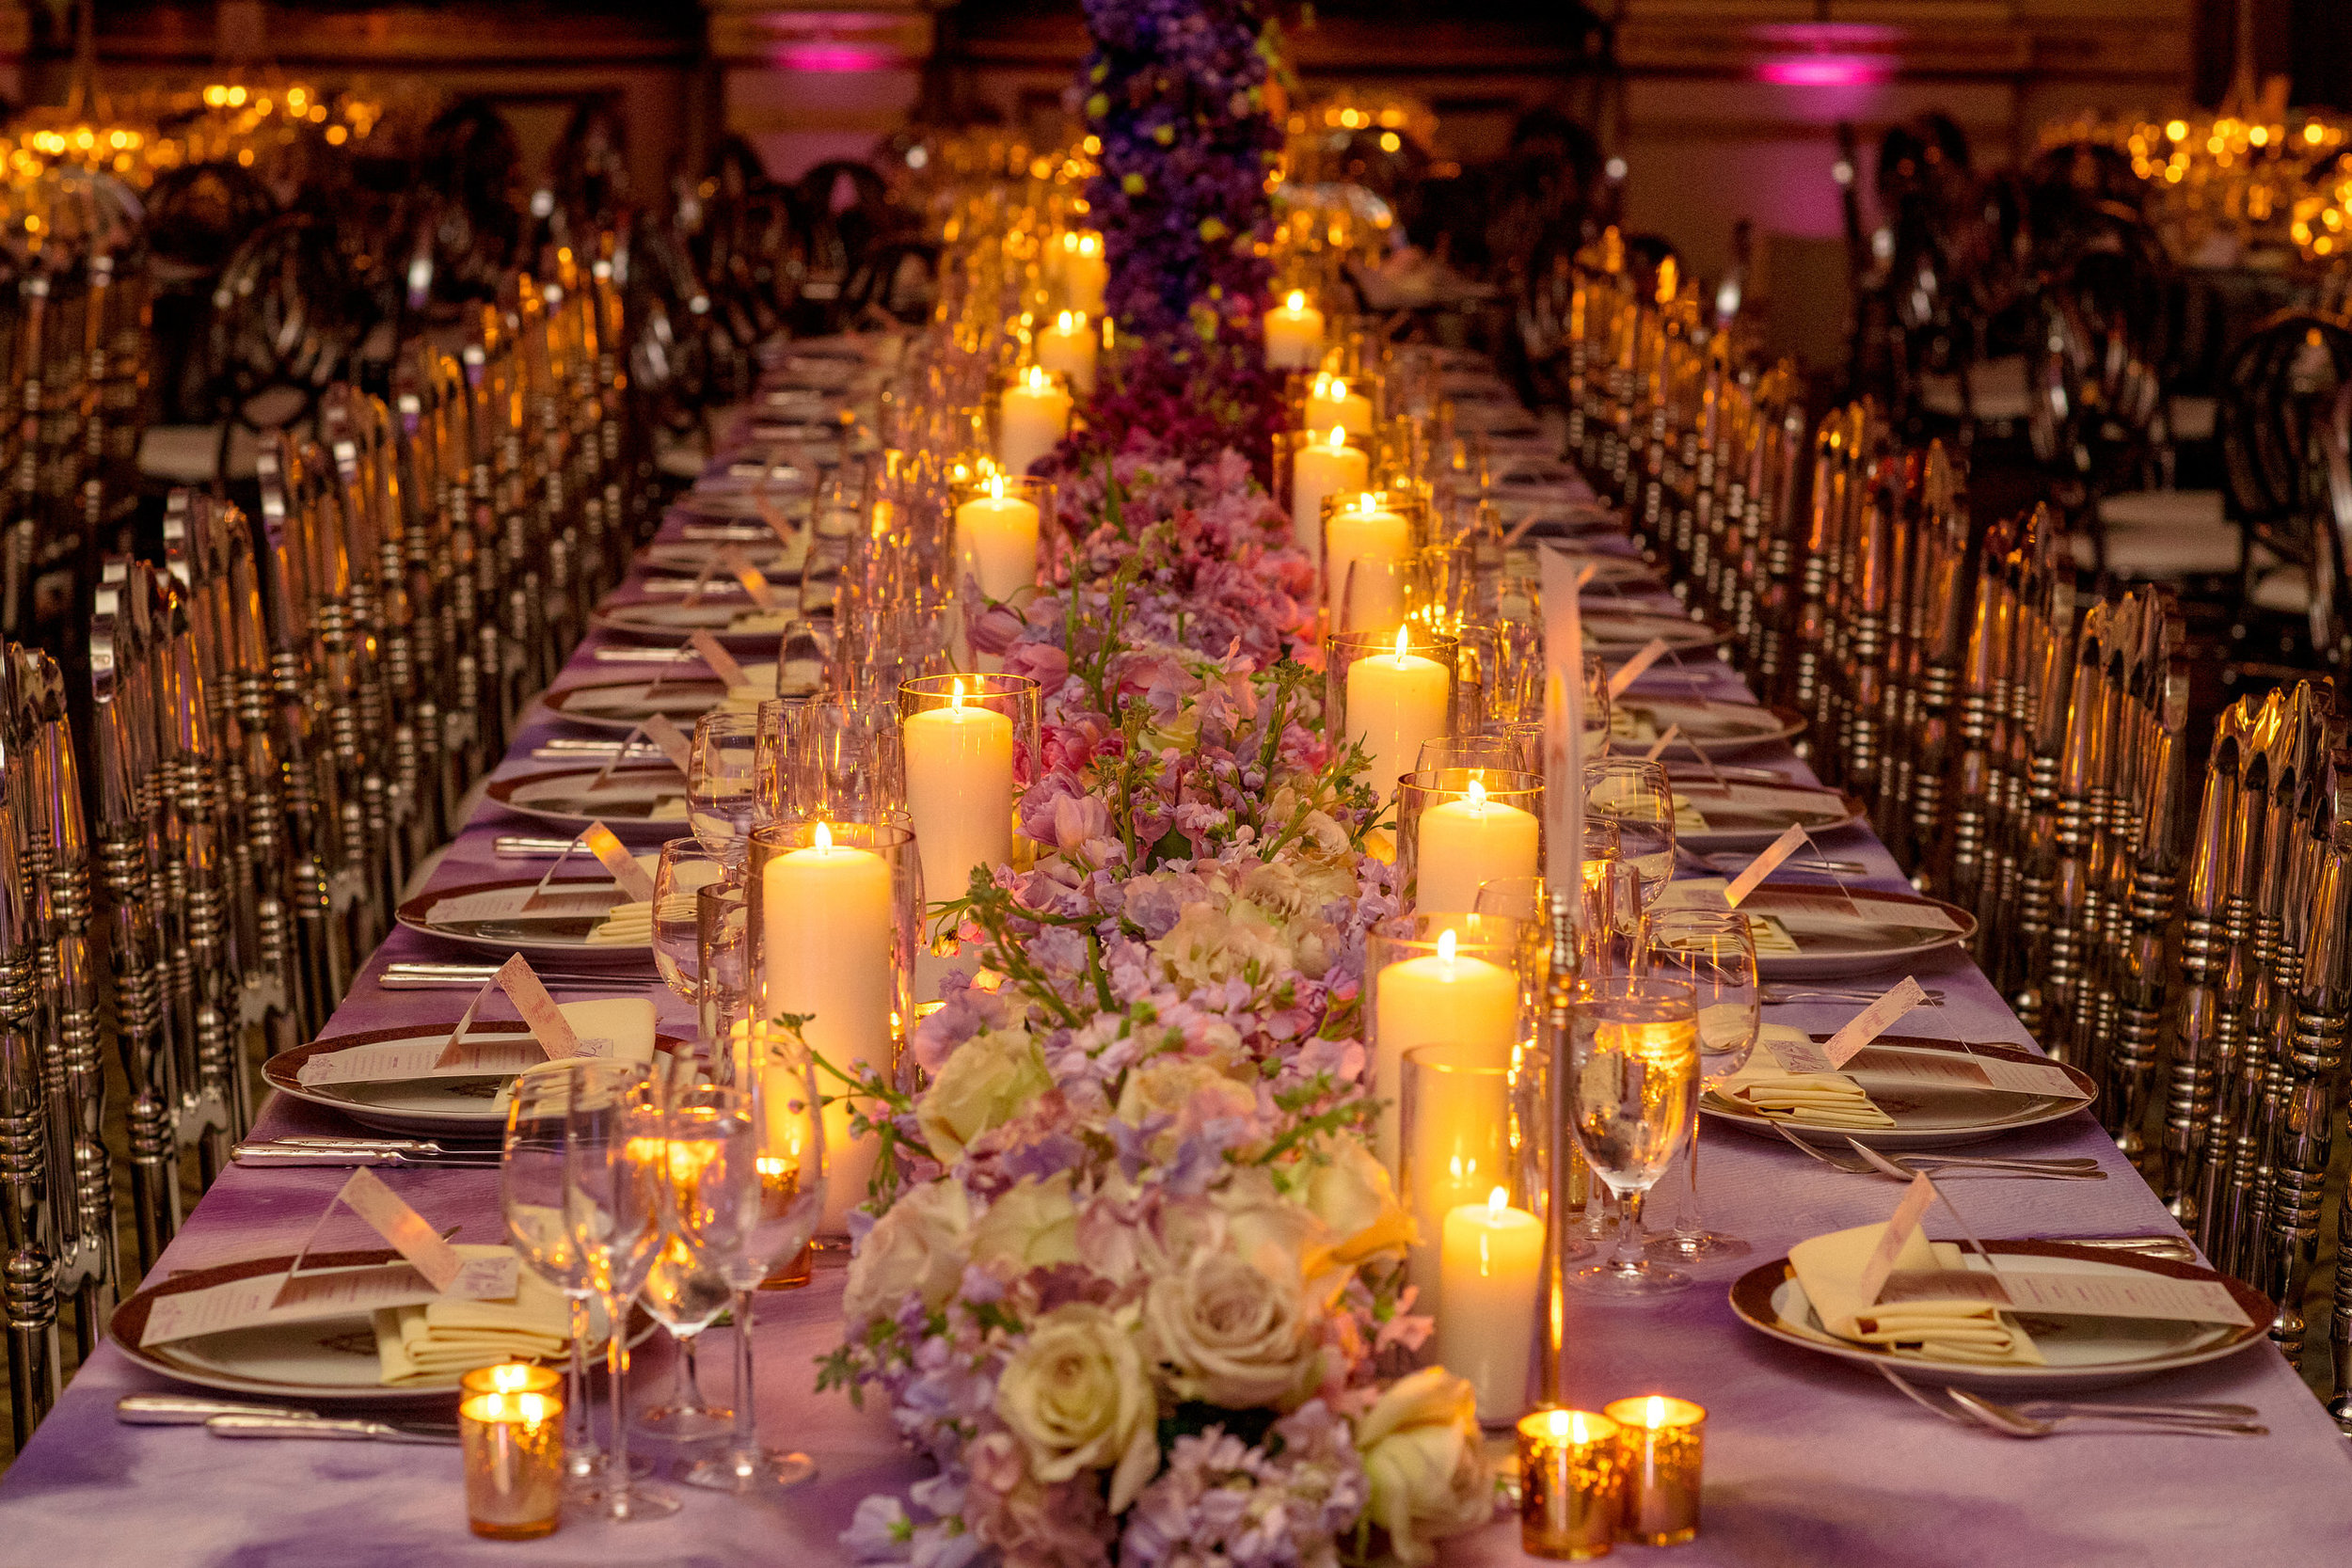 INDIAN WEDDING RECEPTION TABLE SETTING.JPG